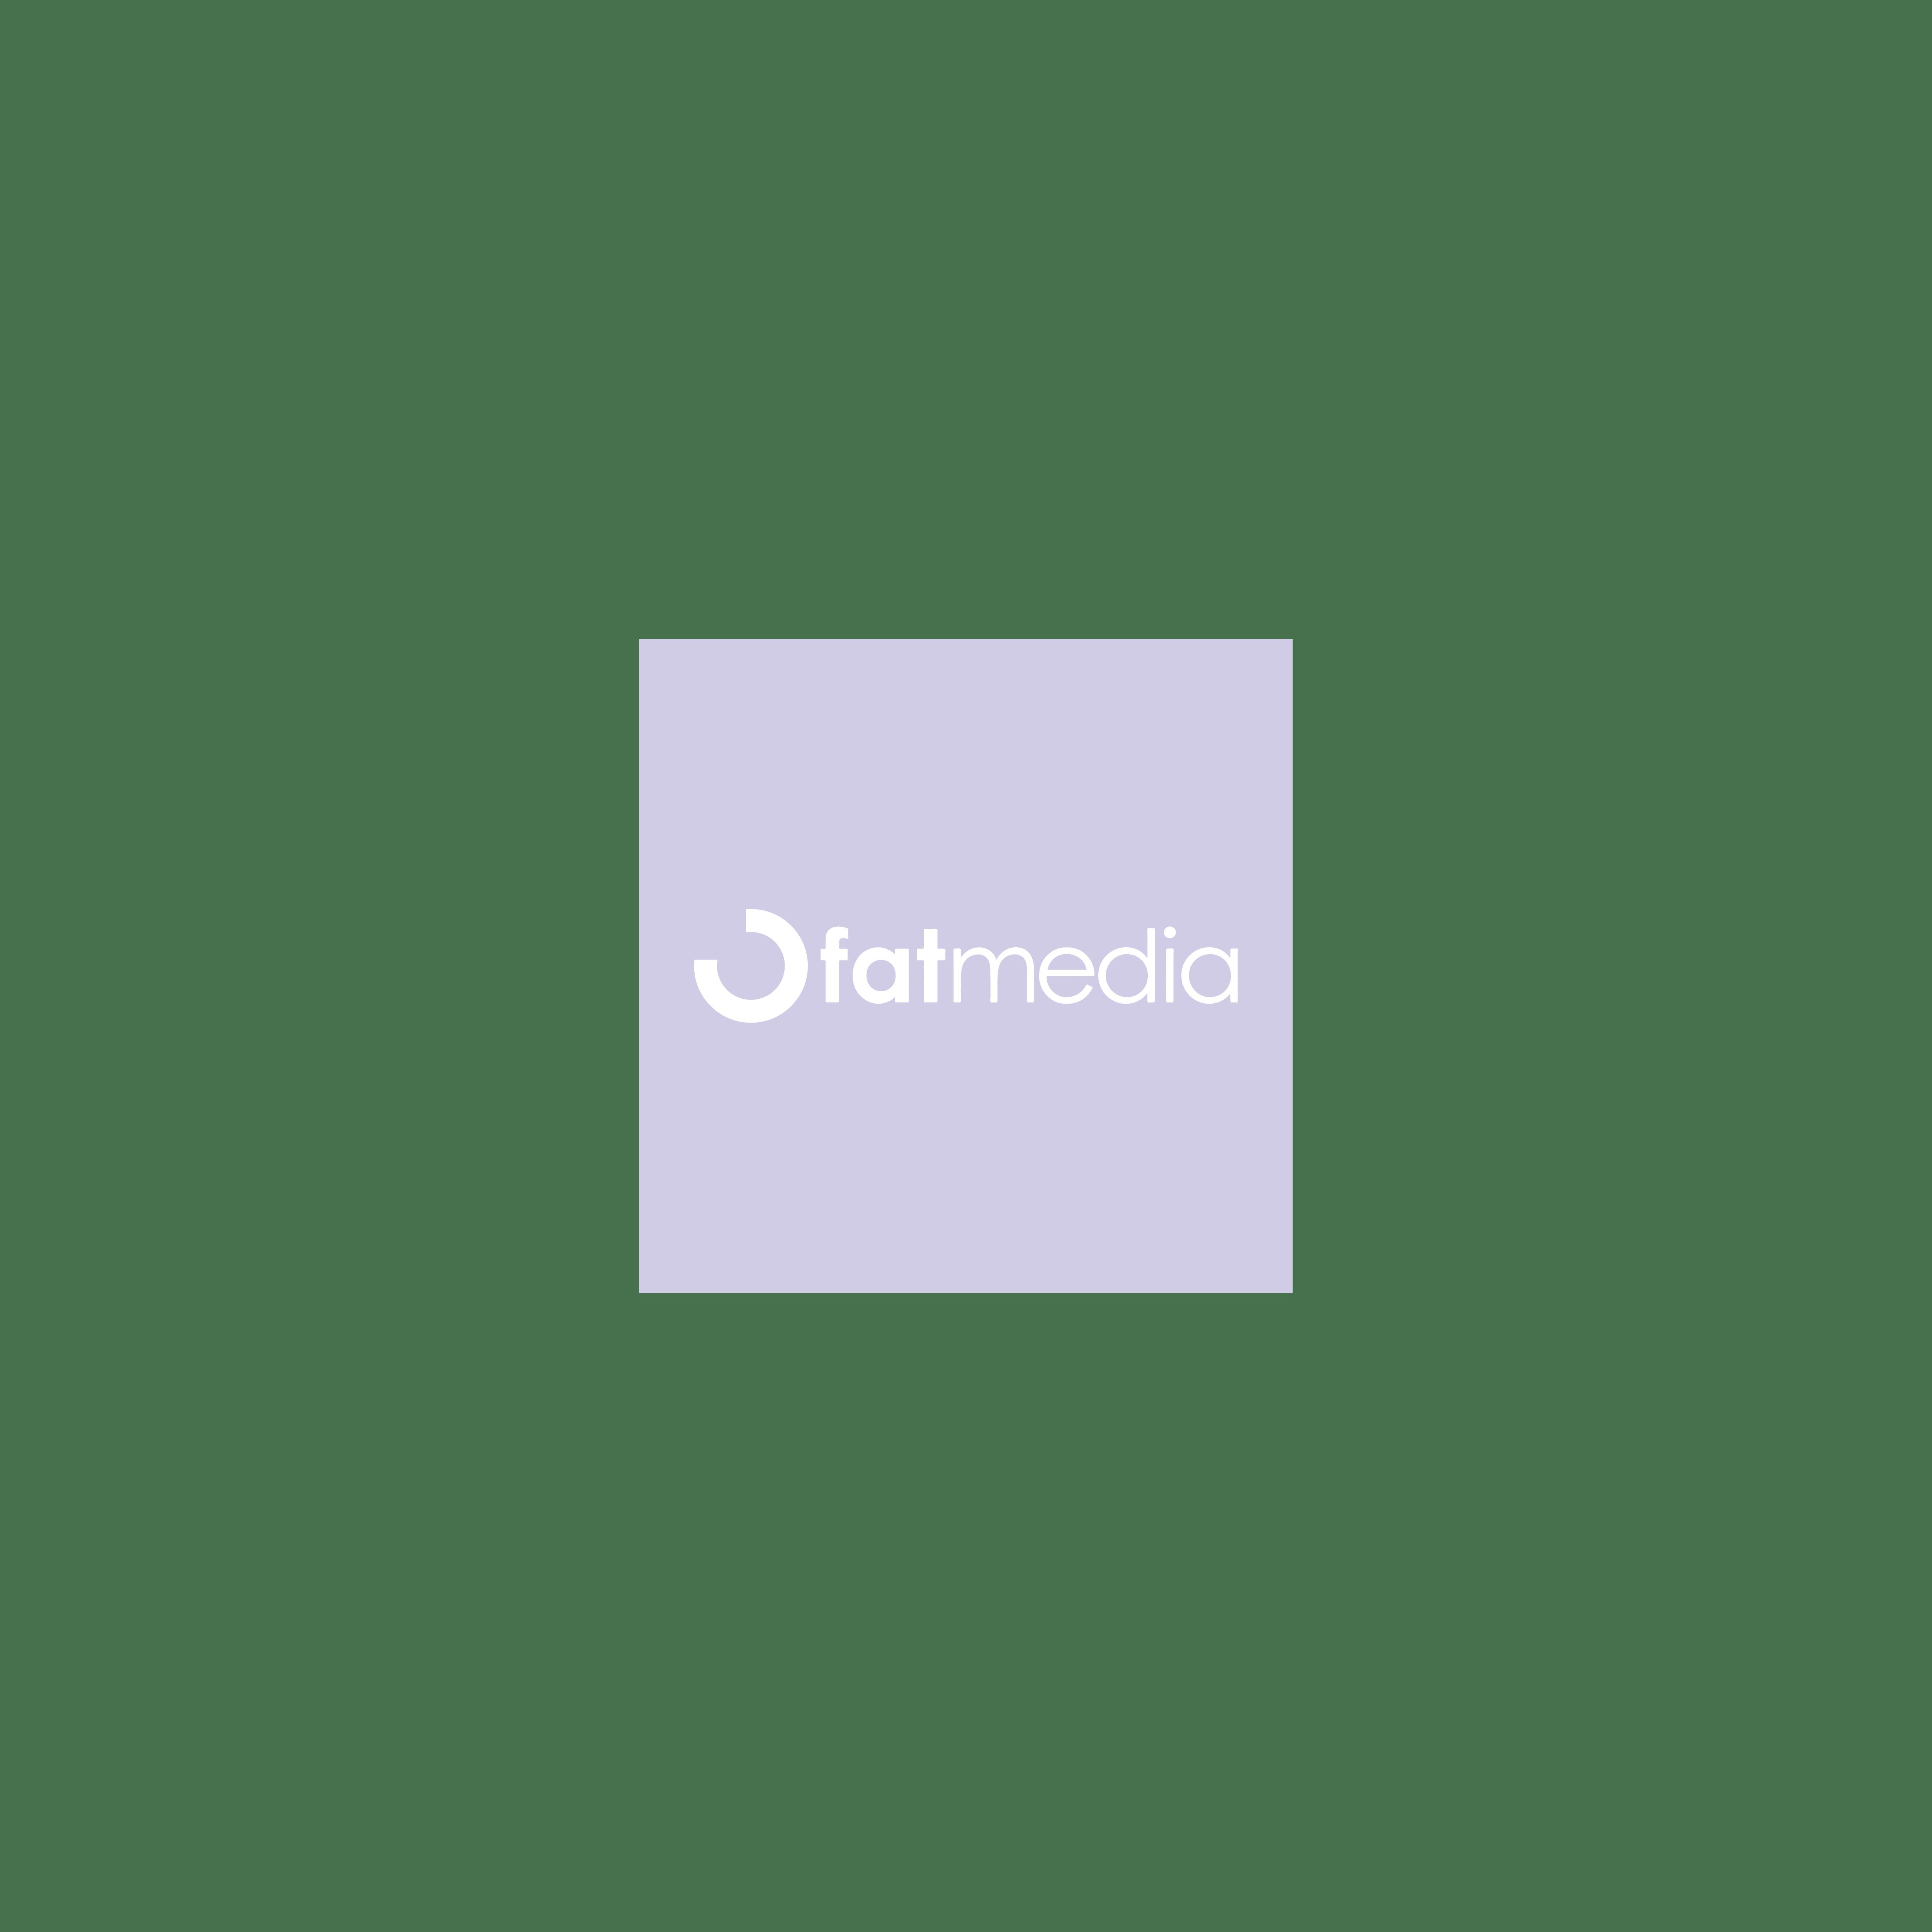 fatmedia planable customer logo